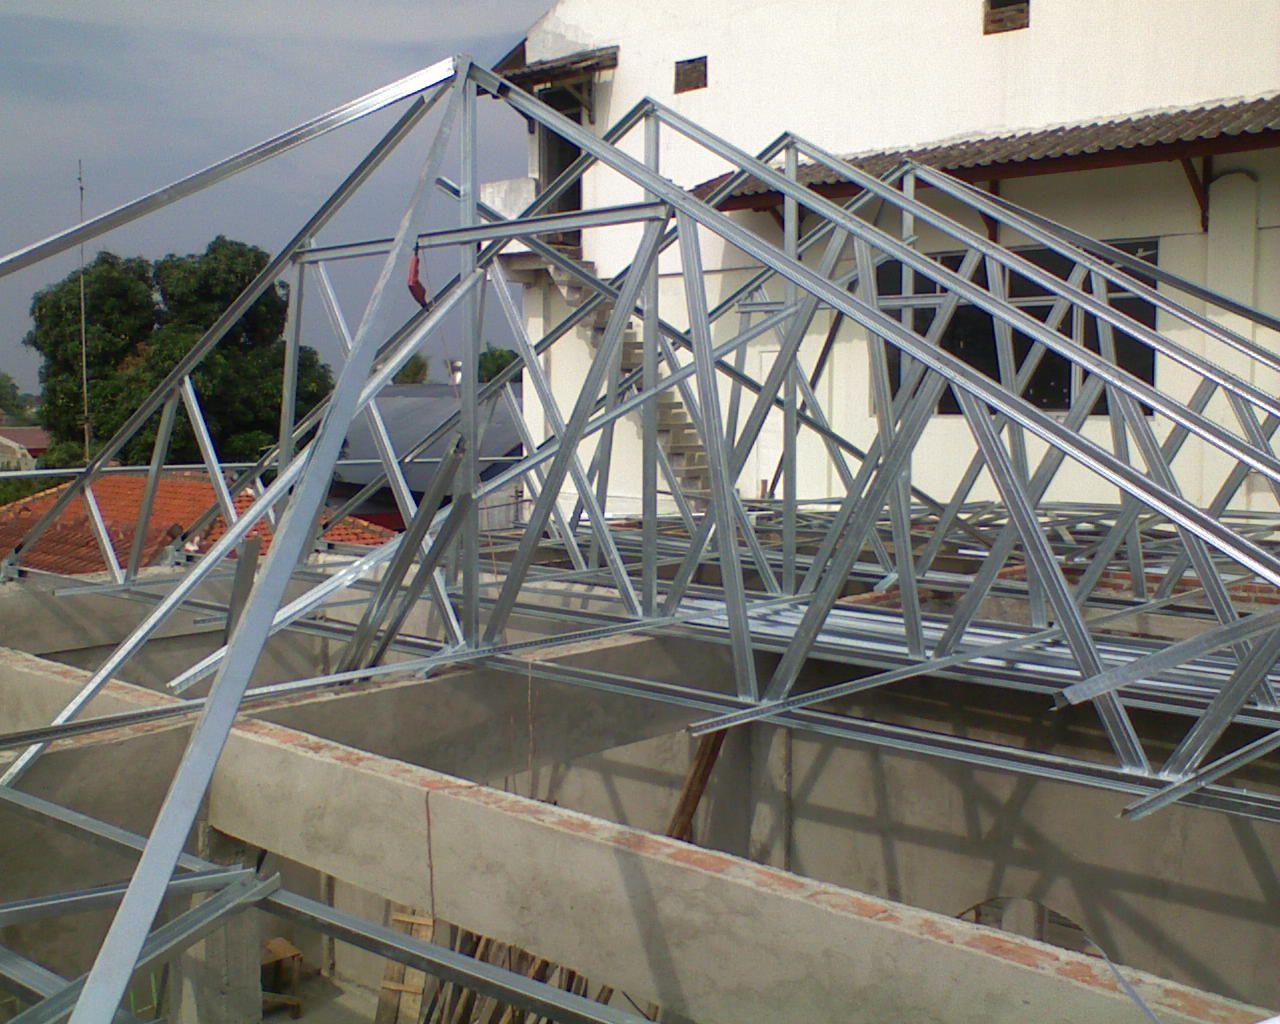 Pemasangan Atap Baja Ringan Balikpapan Advertising Jasa Produksi Neon Box Toko